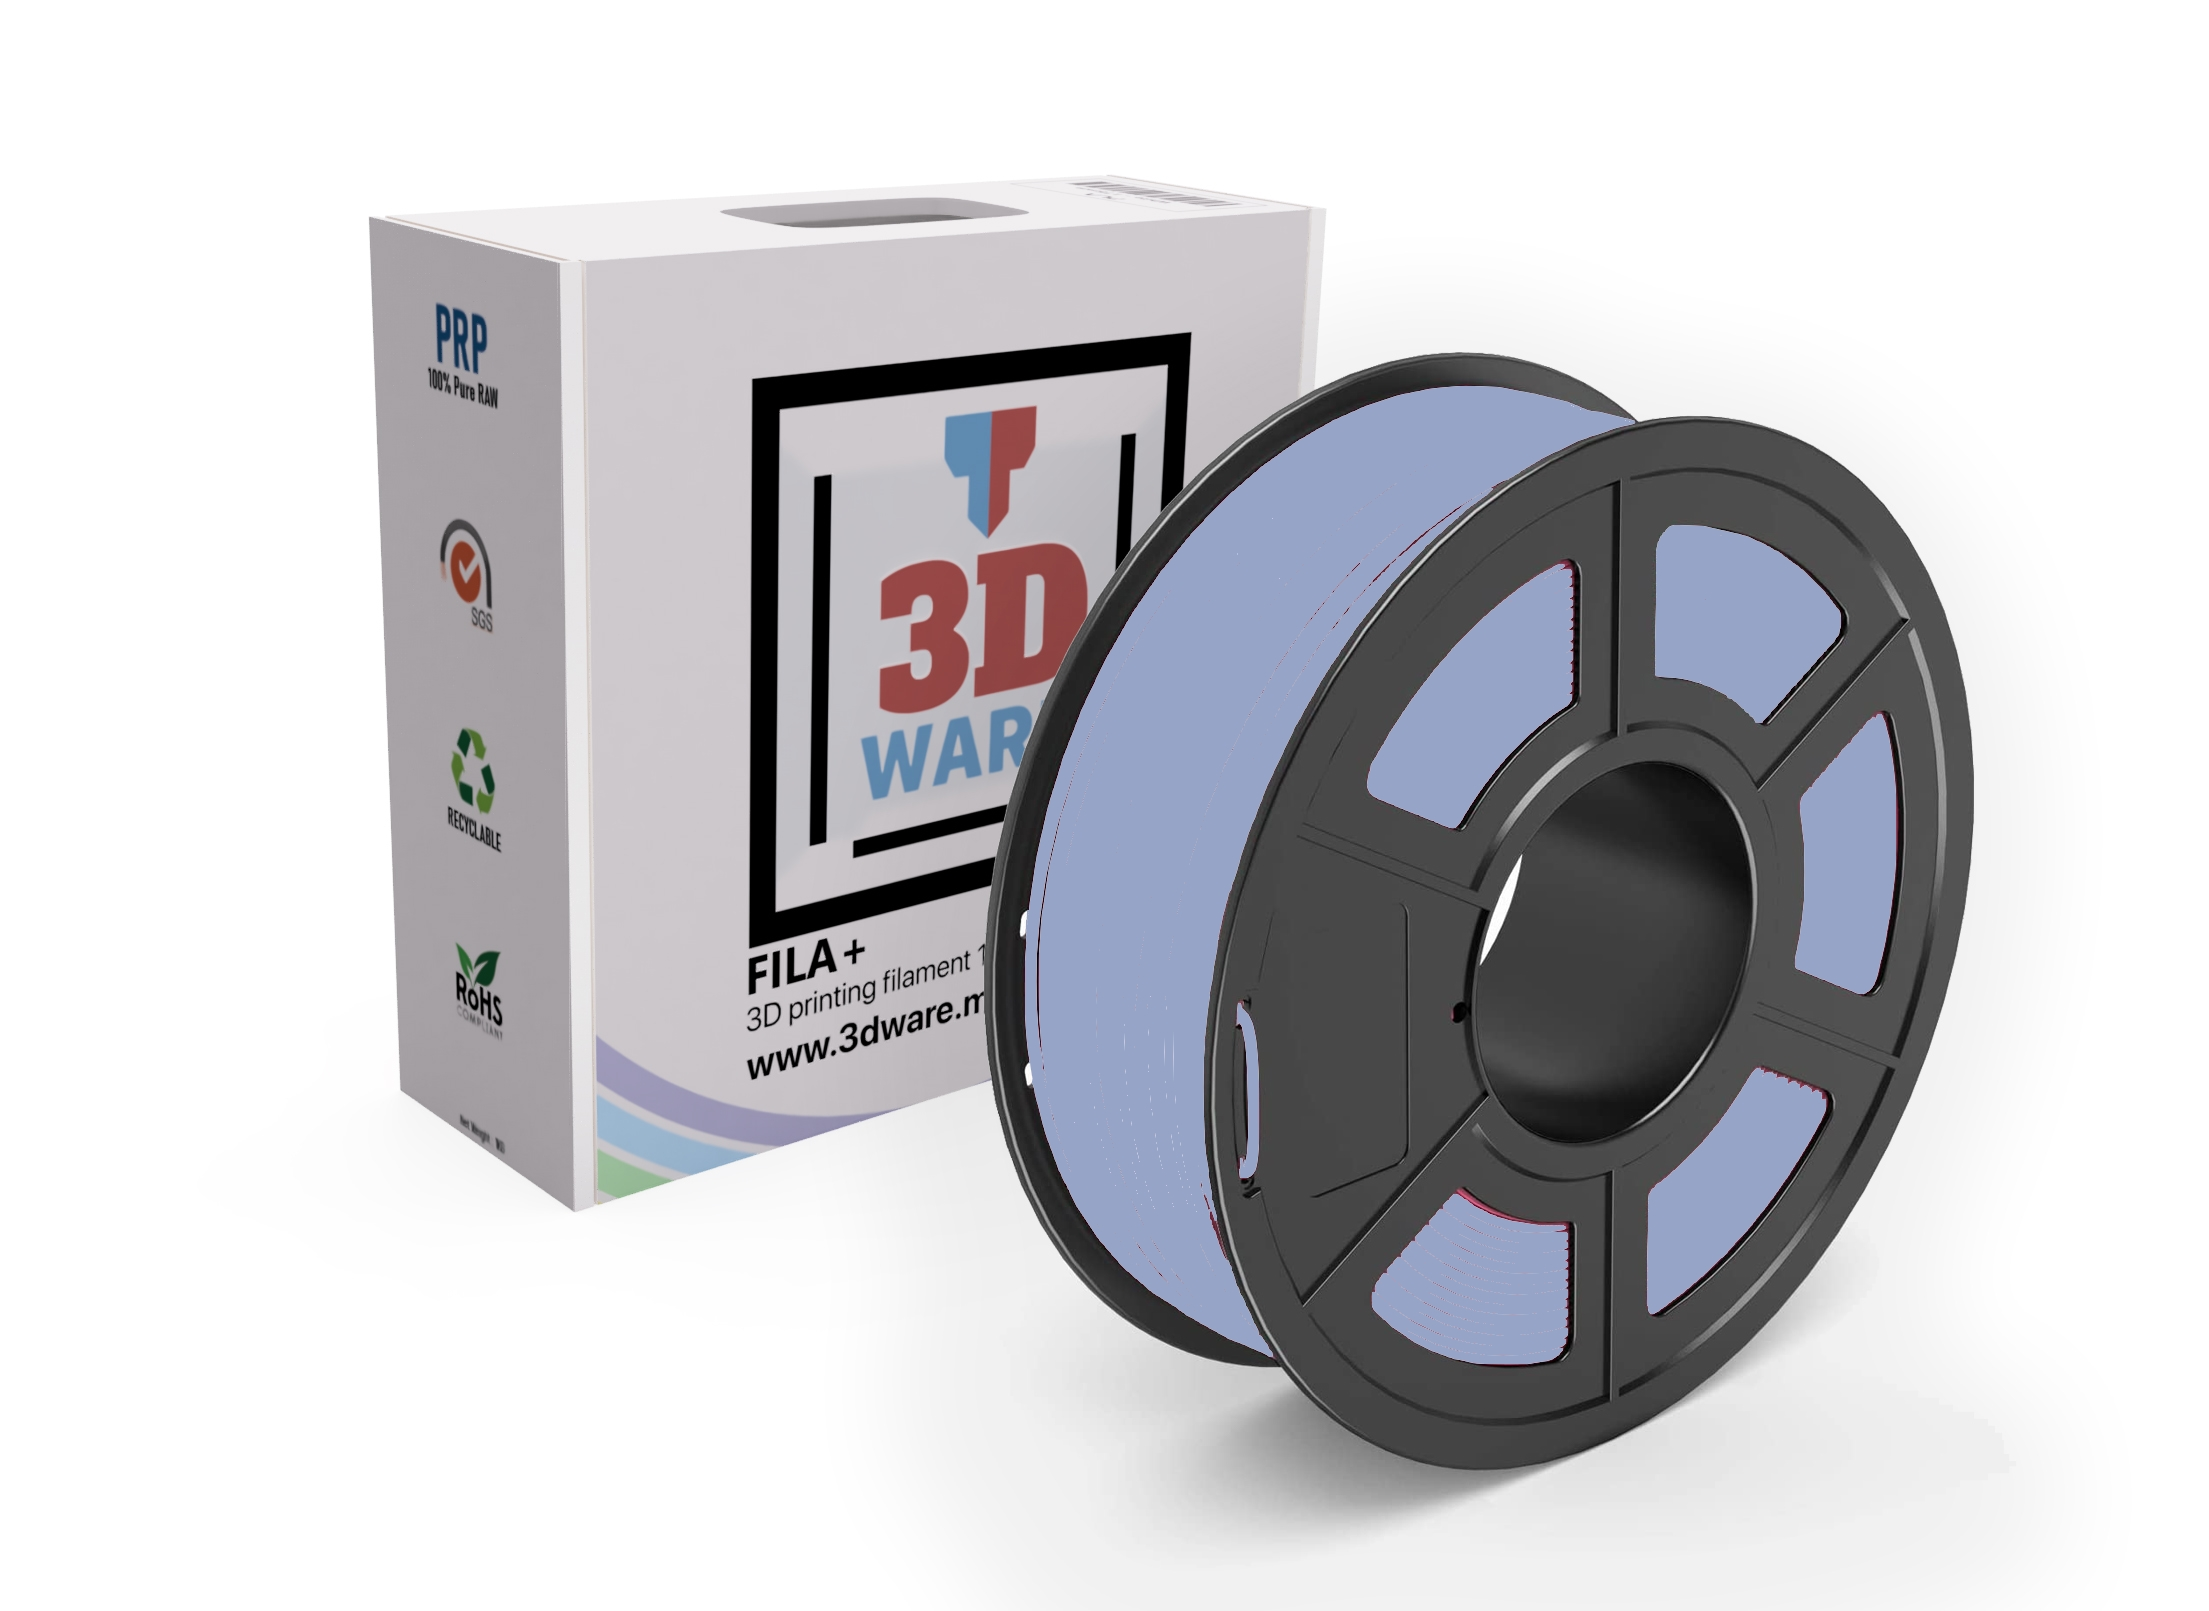 Filament 3D PLA FILA+ Standard Argent 1.75mm 1kg